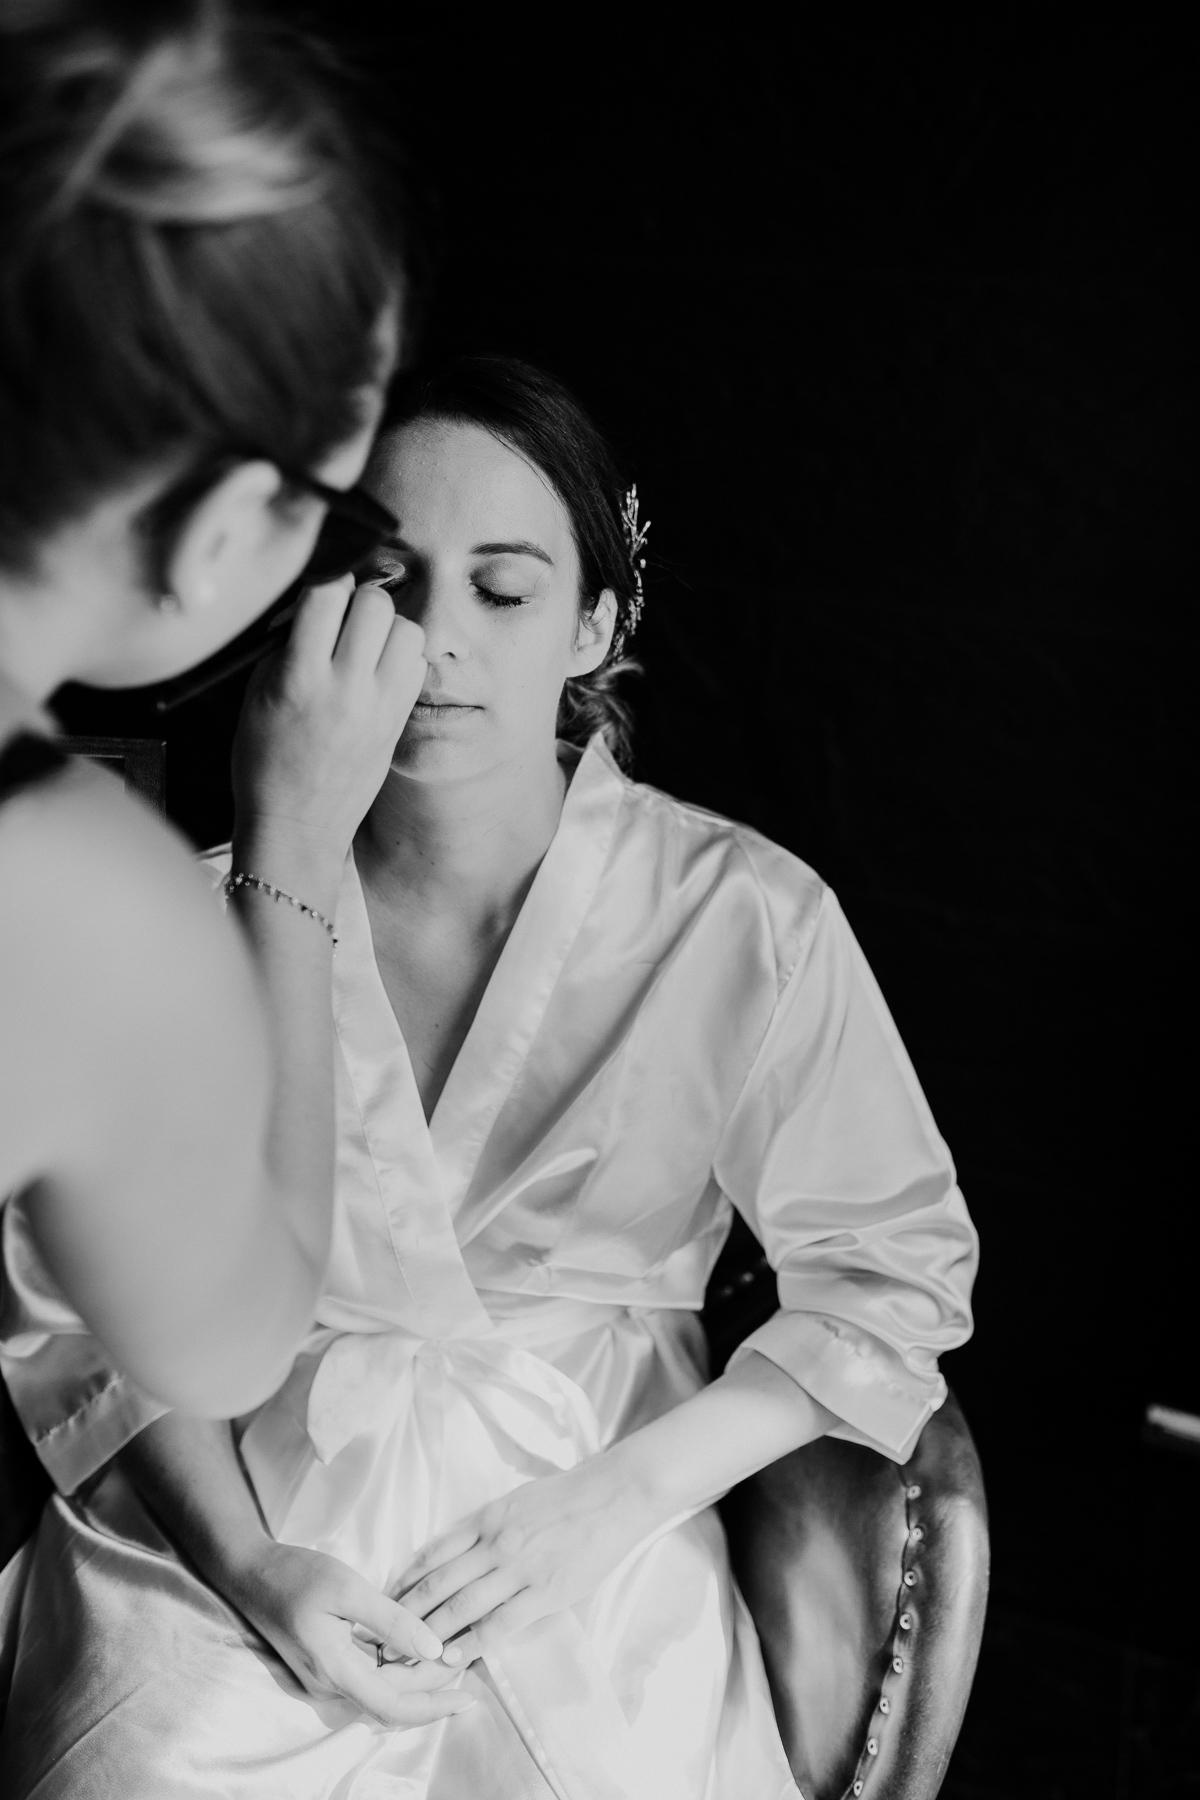 Photographe de mariage chateau boisrigaud usson auvergne maquillage